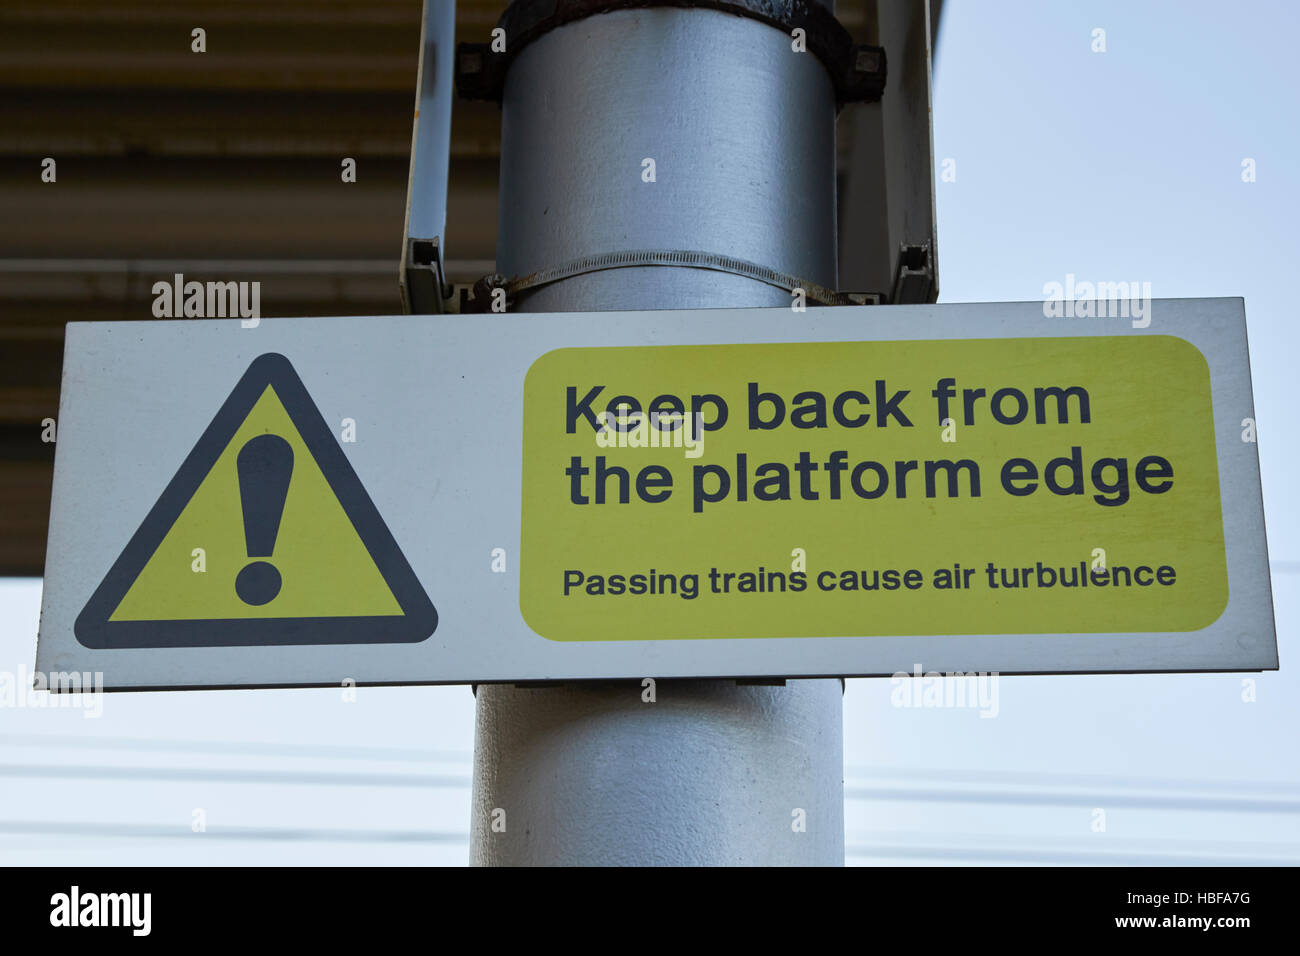 train station platform warning sign keep back from platform edge passing trains cause air turbulence - Stock Image